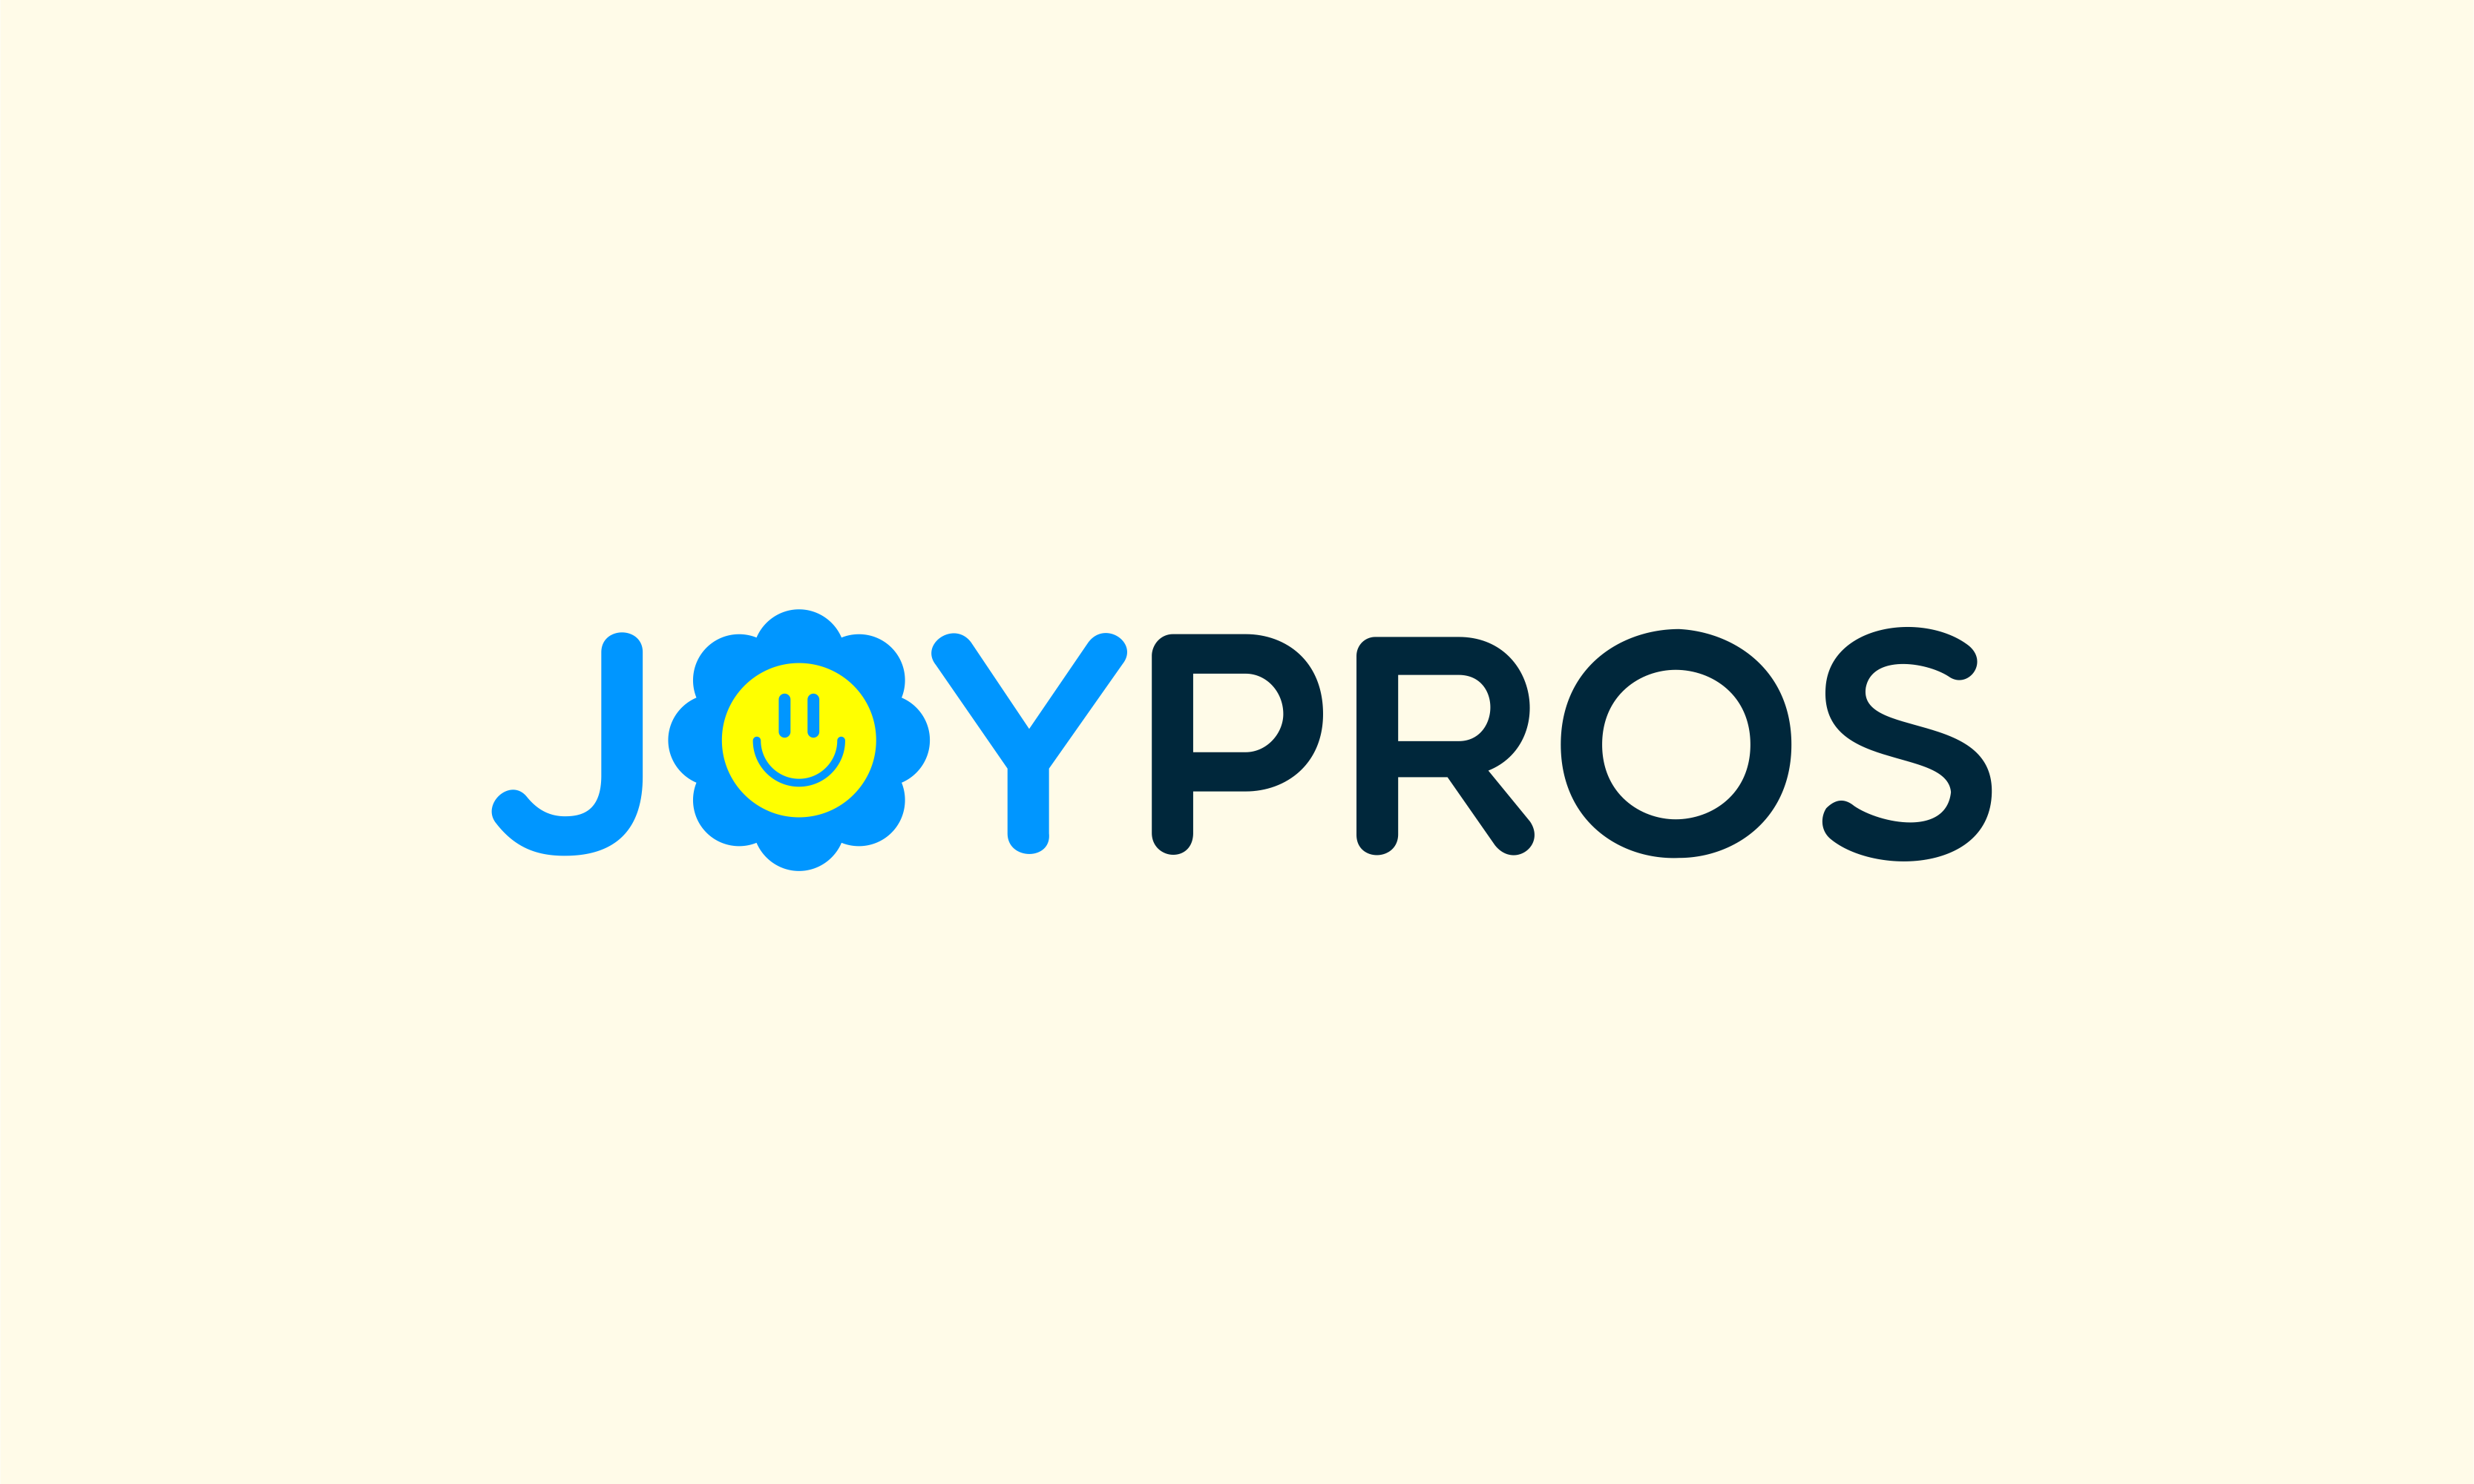 Joypros